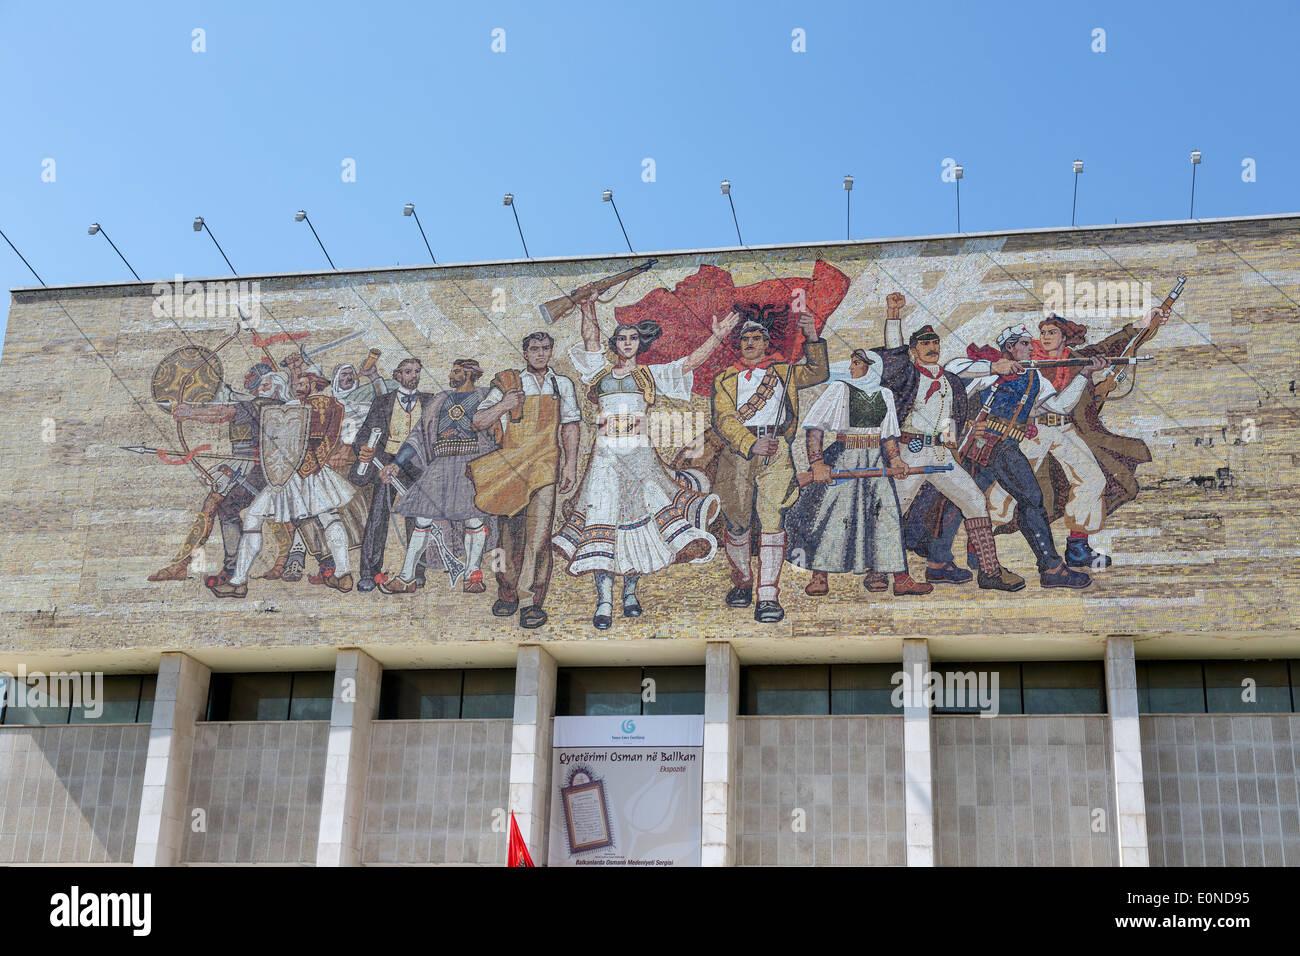 The National Historical Museum, Skanderbeg Square, Tirana, Albania - Stock Image